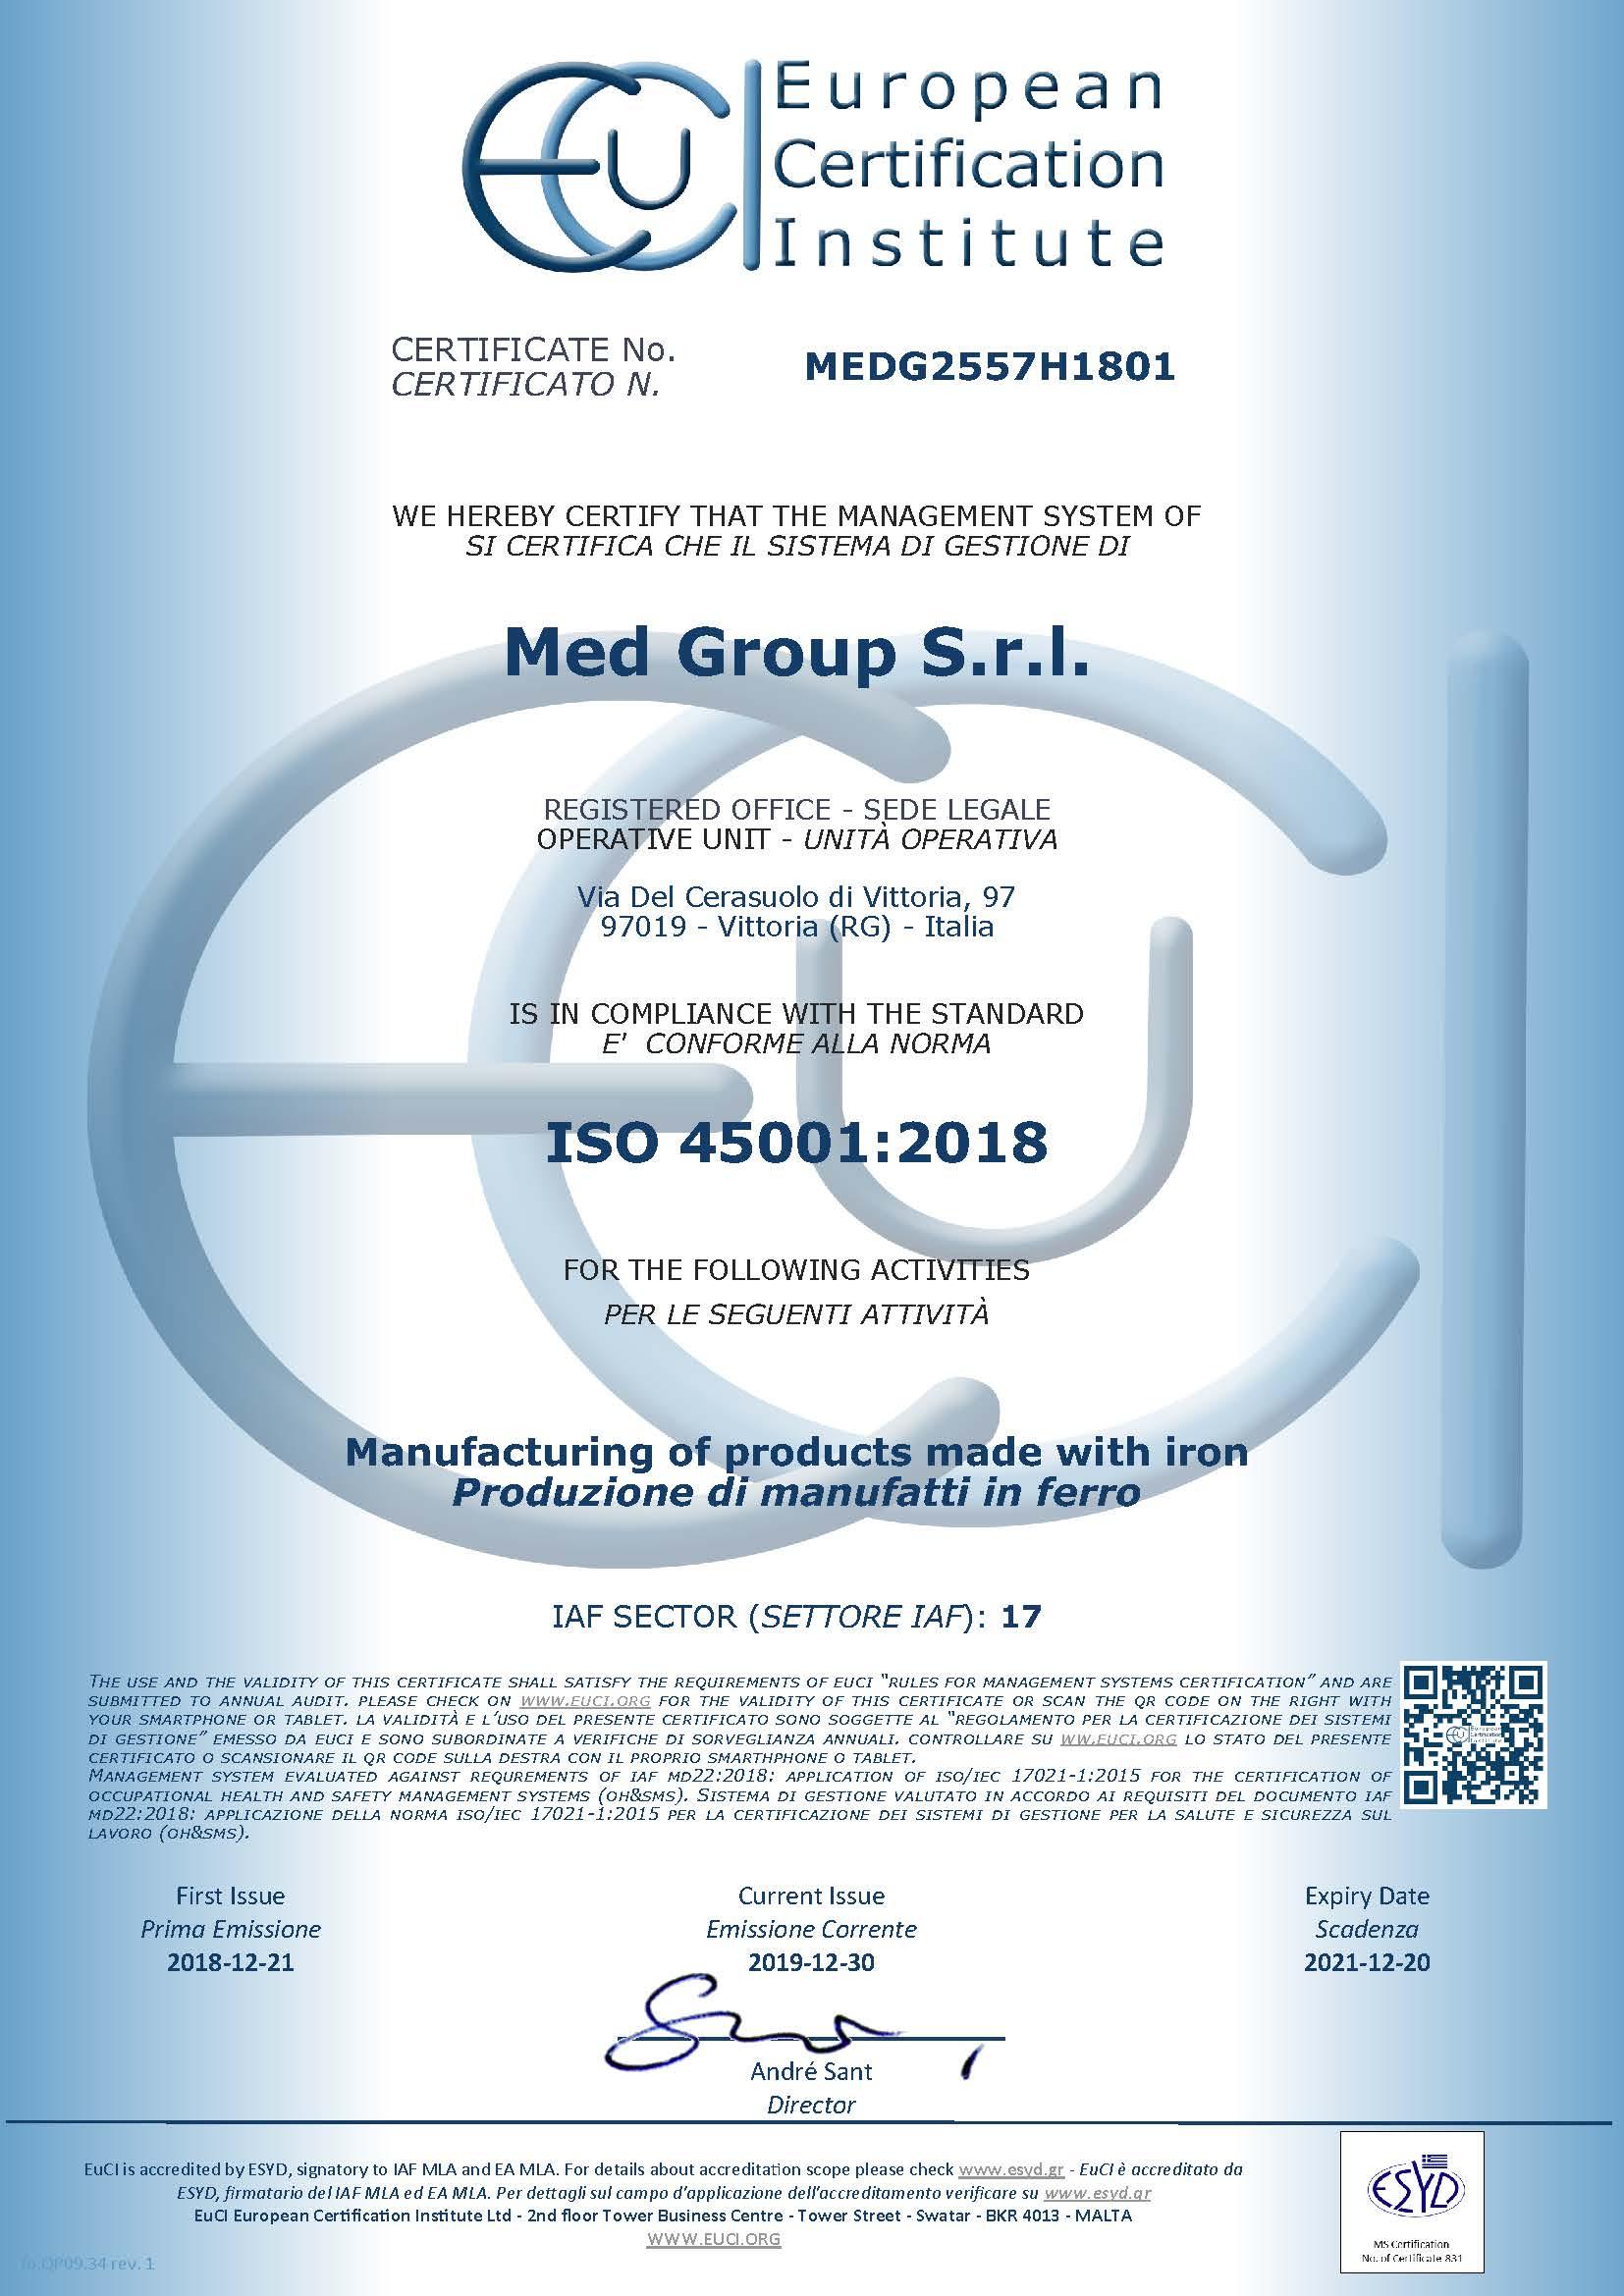 MEDG2557H1801 certificate release 20191230